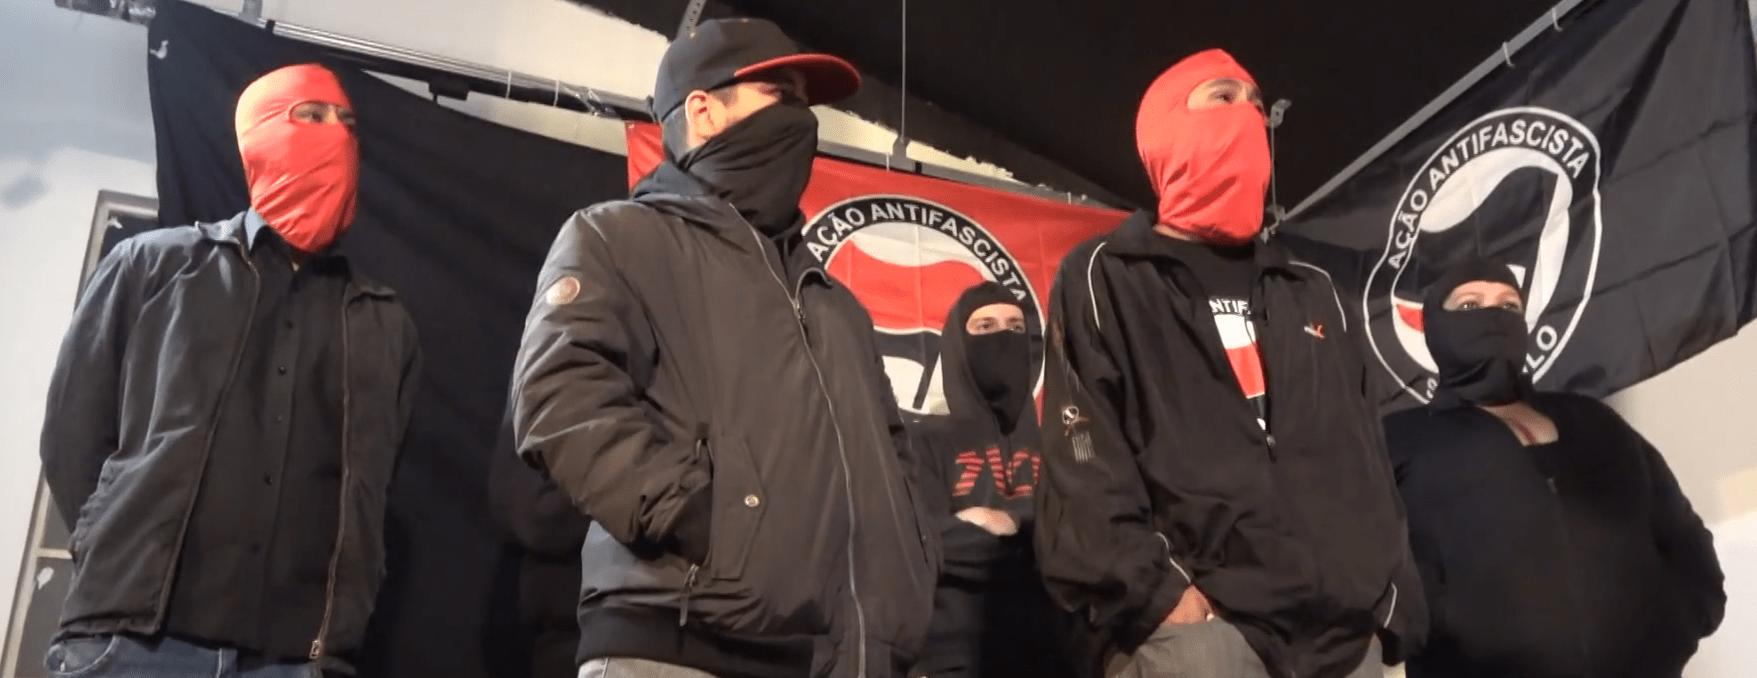 antifas, CNN, fascismo